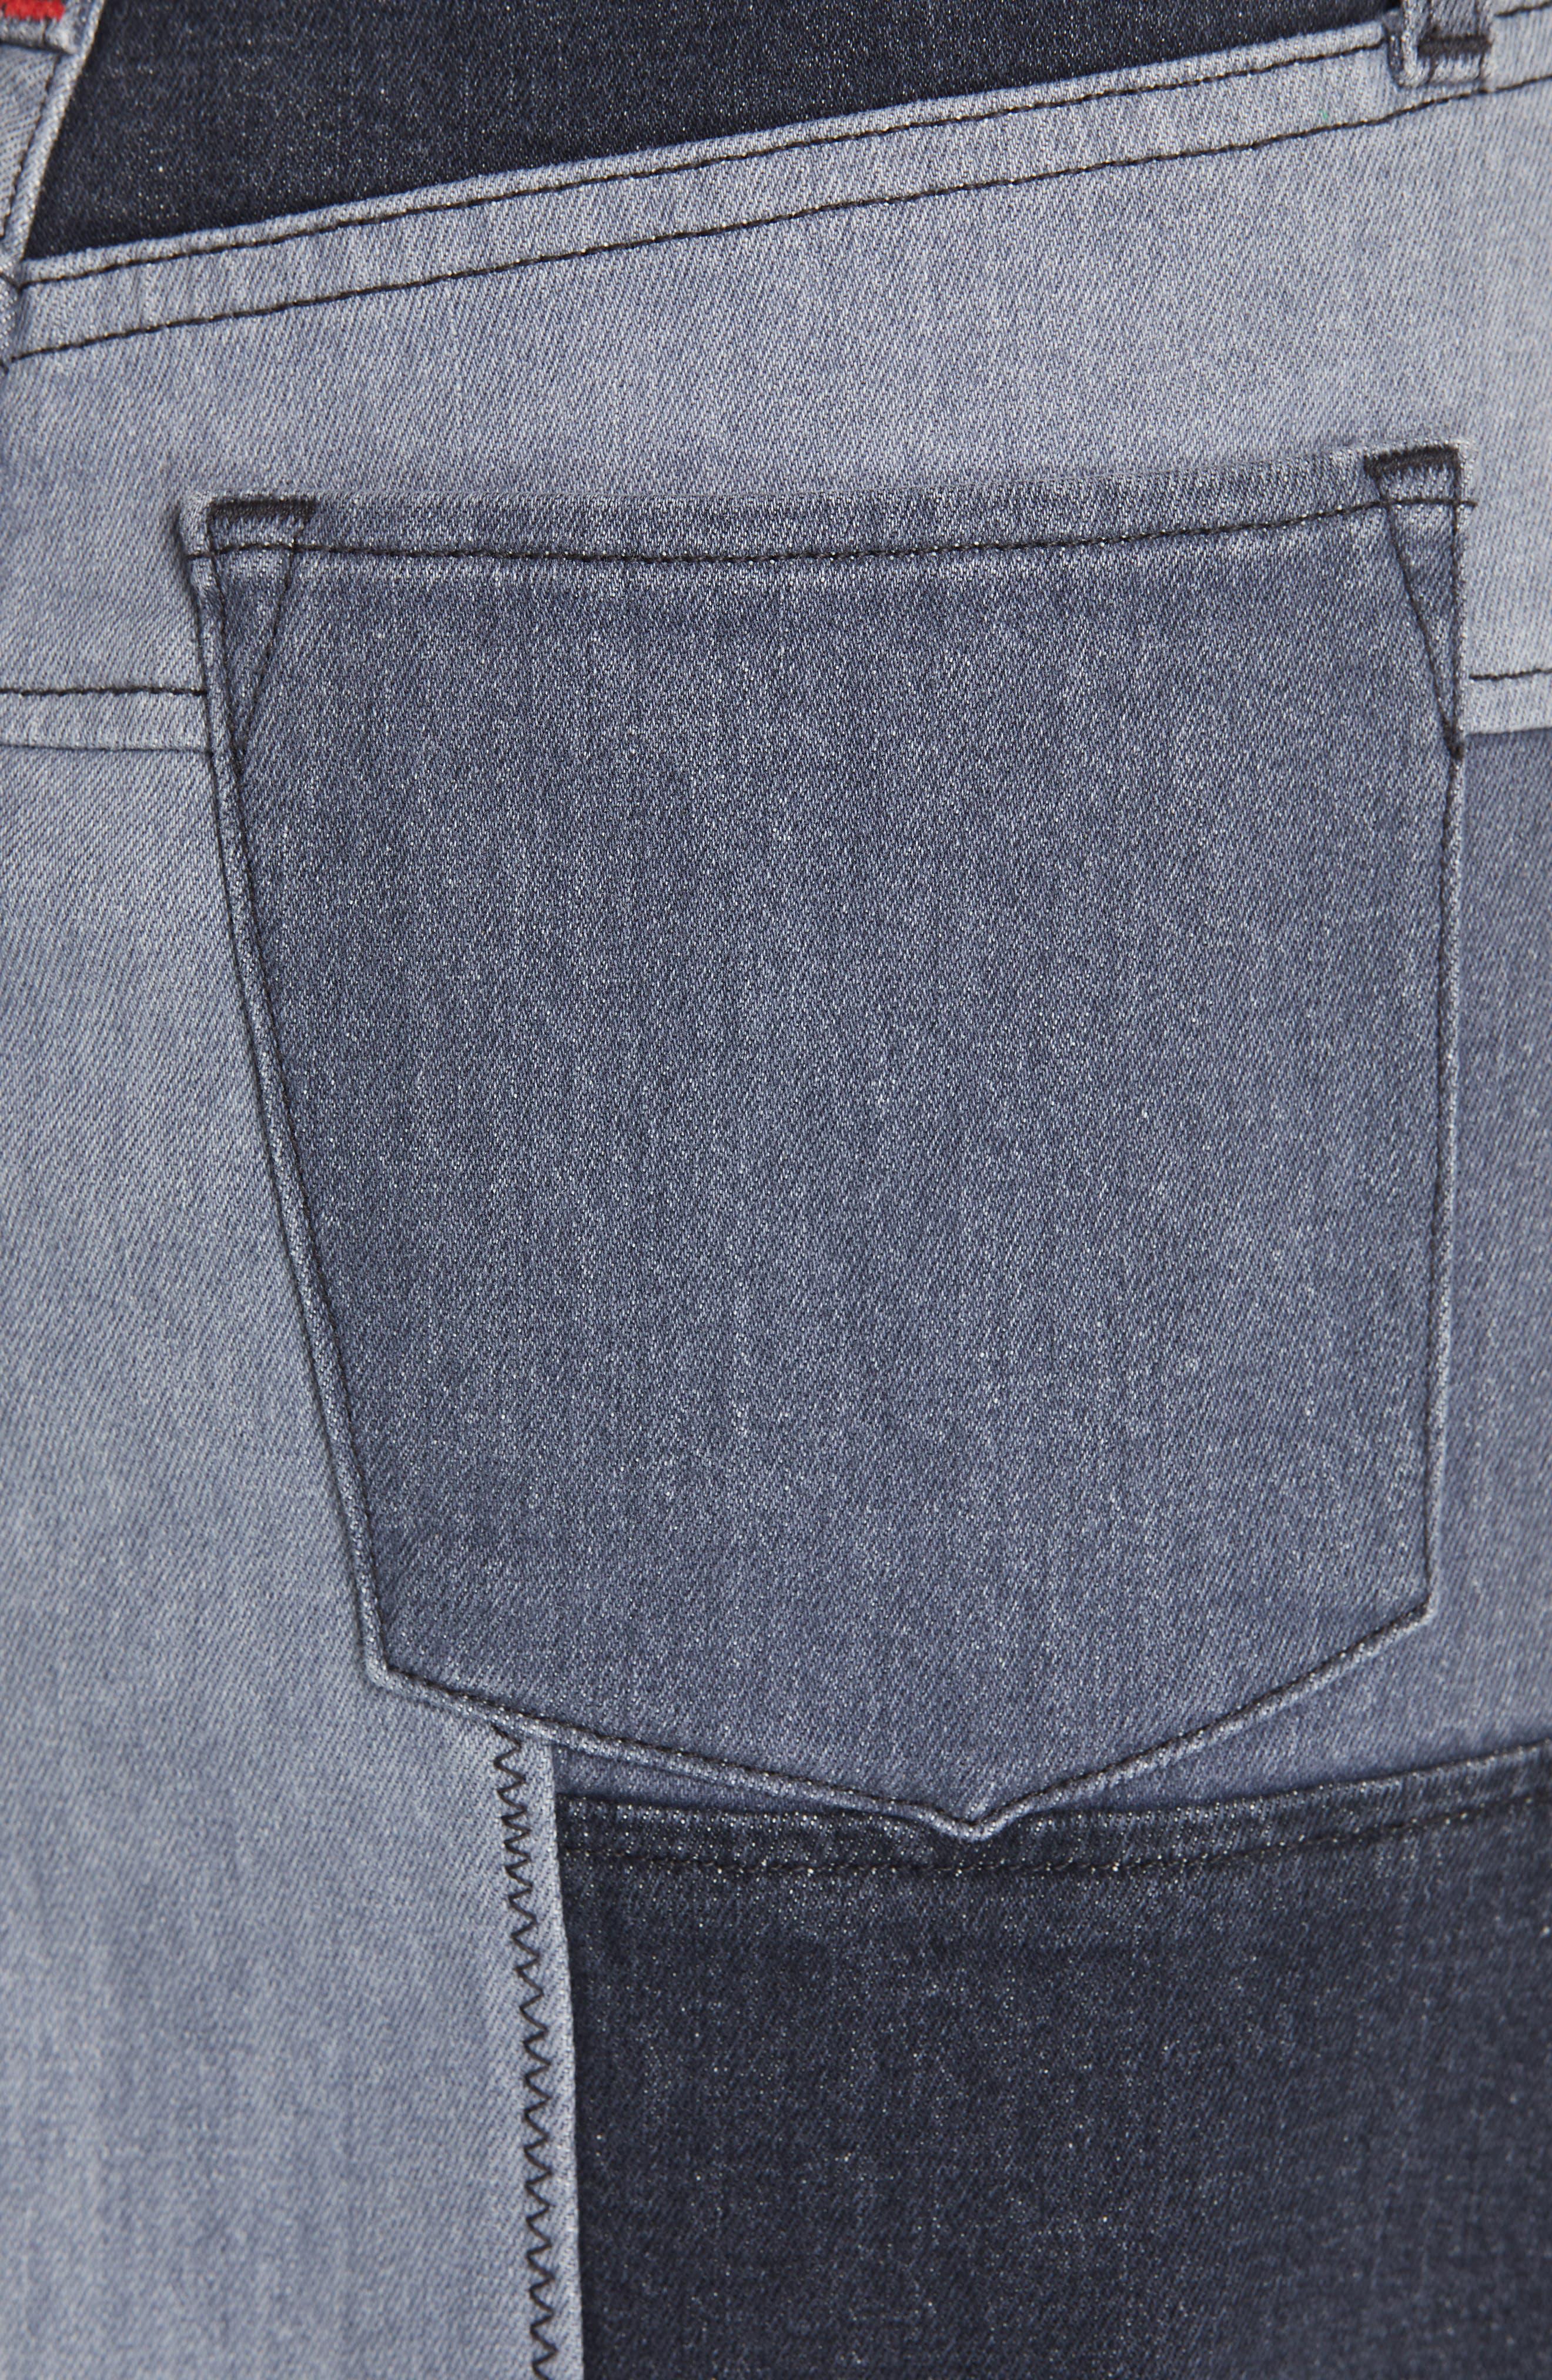 ALICE + OLIVIA JEANS,                             Amazing Patchwork Denim Miniskirt,                             Alternate thumbnail 5, color,                             NIGHT SKY